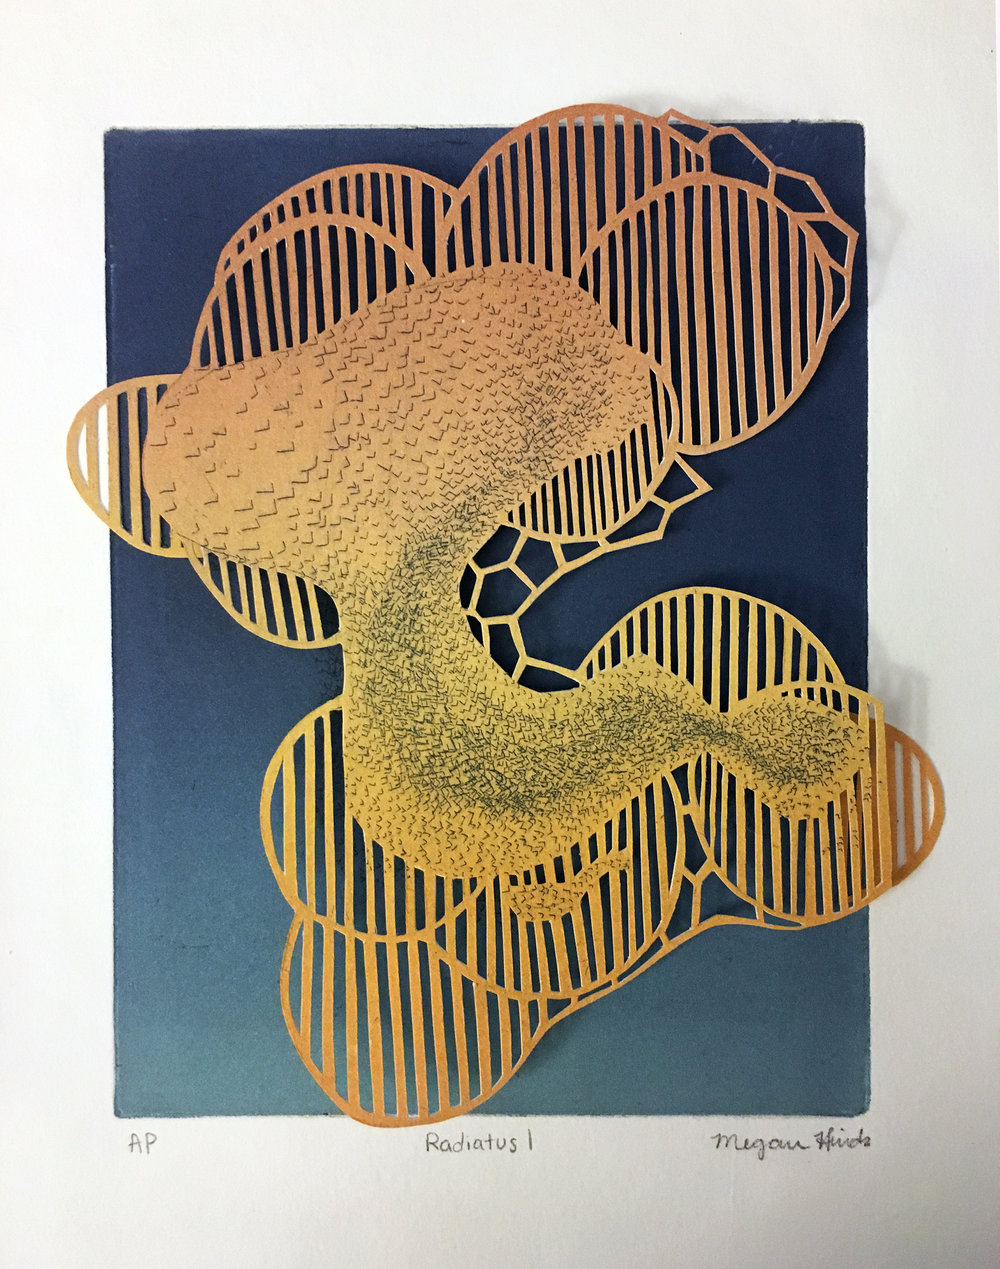 Megan Hinds_Image8_ Radiatus I_Intaglio, Monotype, Hand cut paper_ 8ΓÇ¥ x 10ΓÇ¥ x 2ΓÇ¥_$150 .jpg